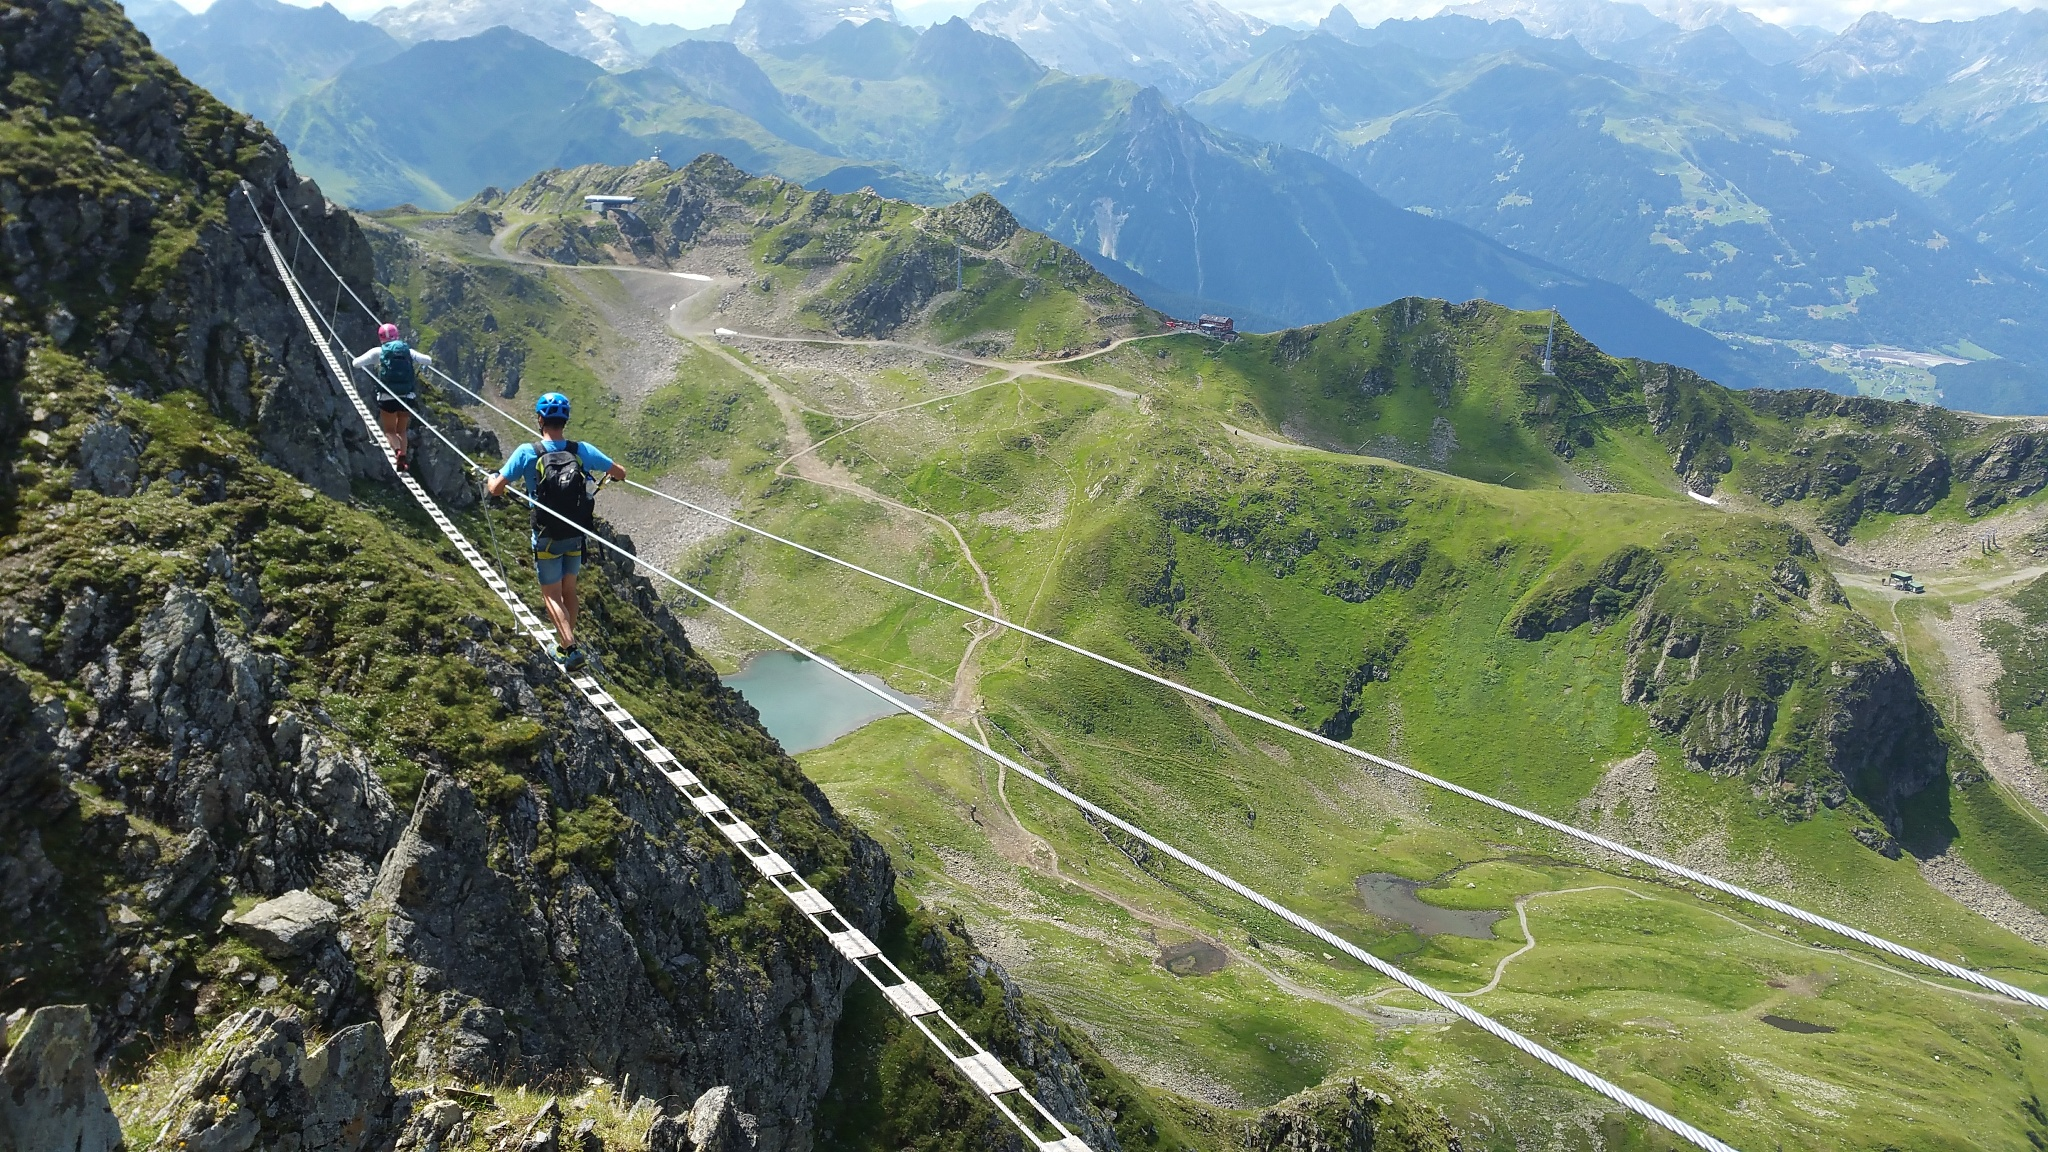 Klettersteig Hochjoch : Klettersteig hochjoch montafon youtube